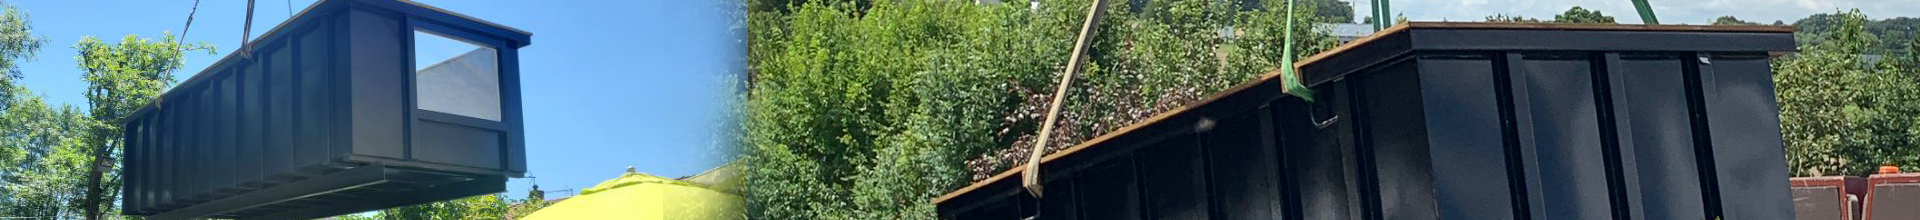 Luxembourg conception container piscine sur mesure Dudelange